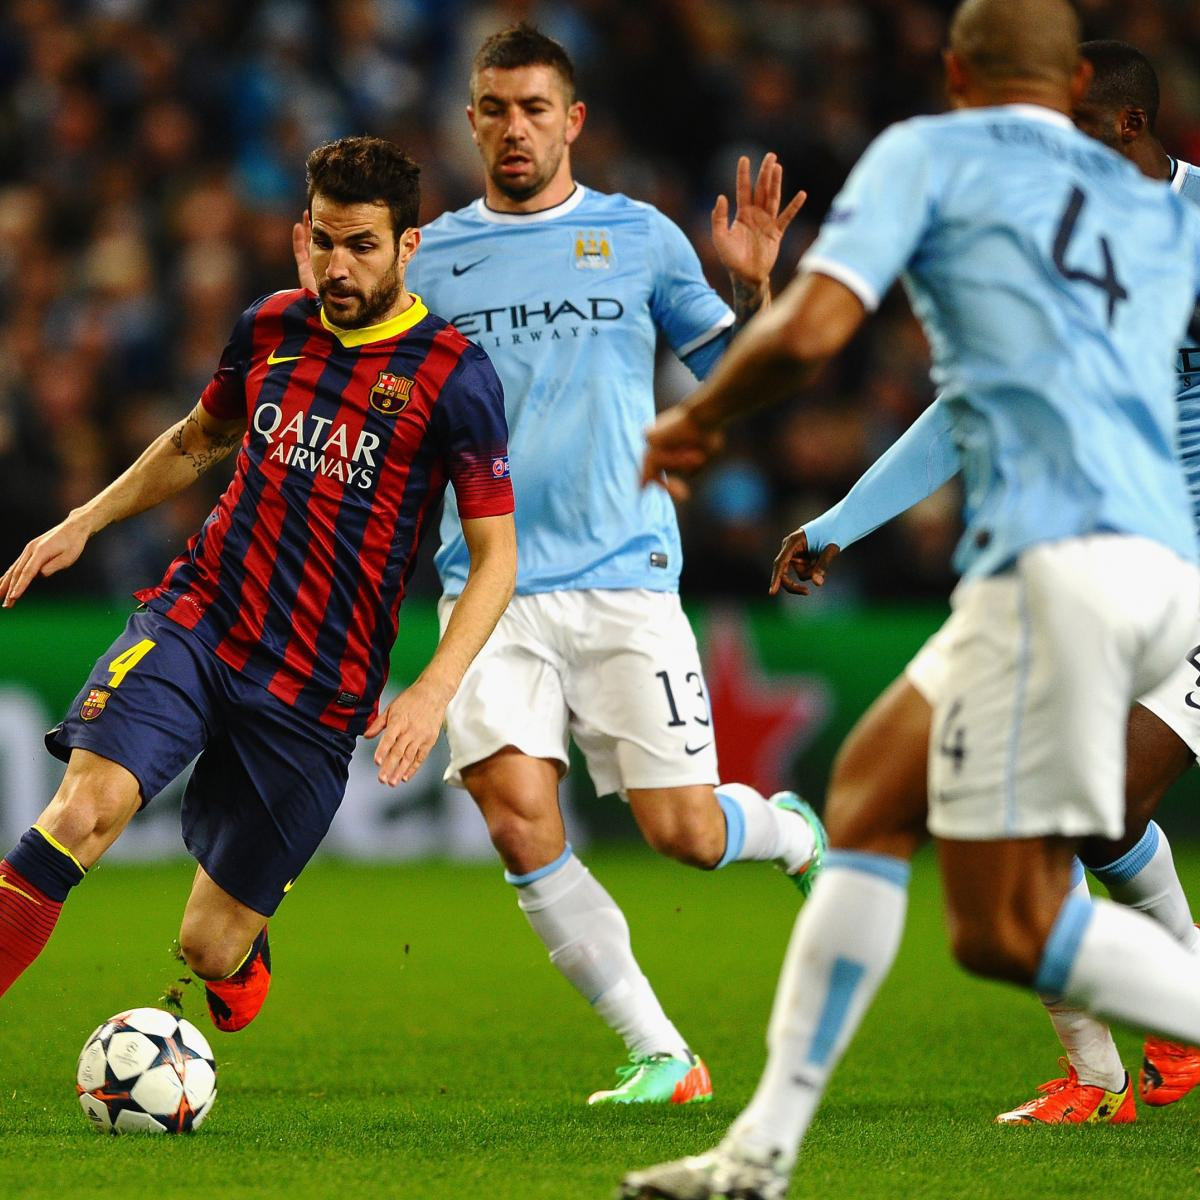 Psg Vs Manchester City Live Score Highlights From: Manchester City Vs. Barcelona: Champions League Live Score